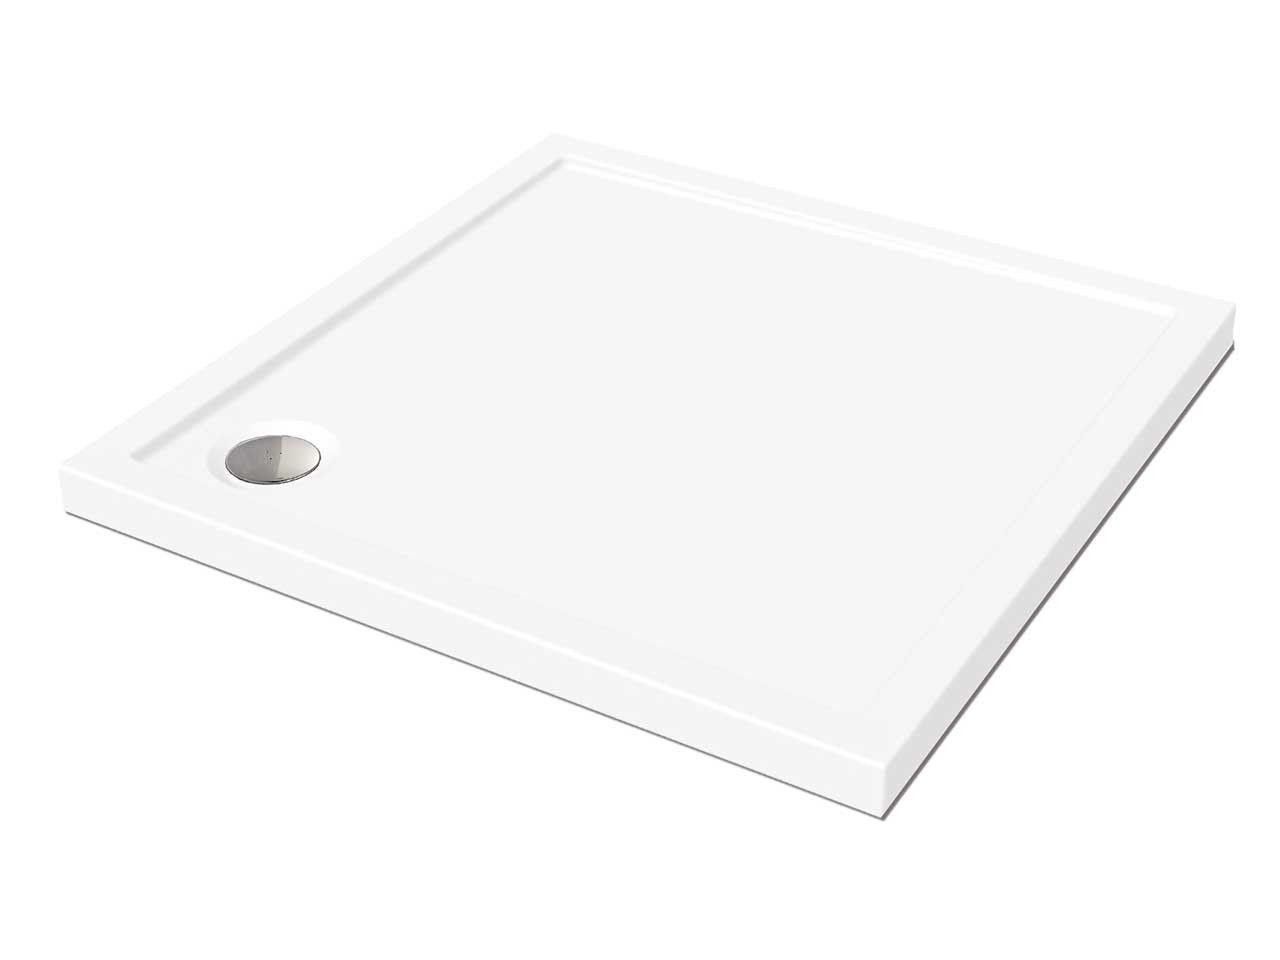 Piatto doccia flat 80x80 h5 bianco venduto da for Doccia iperceramica